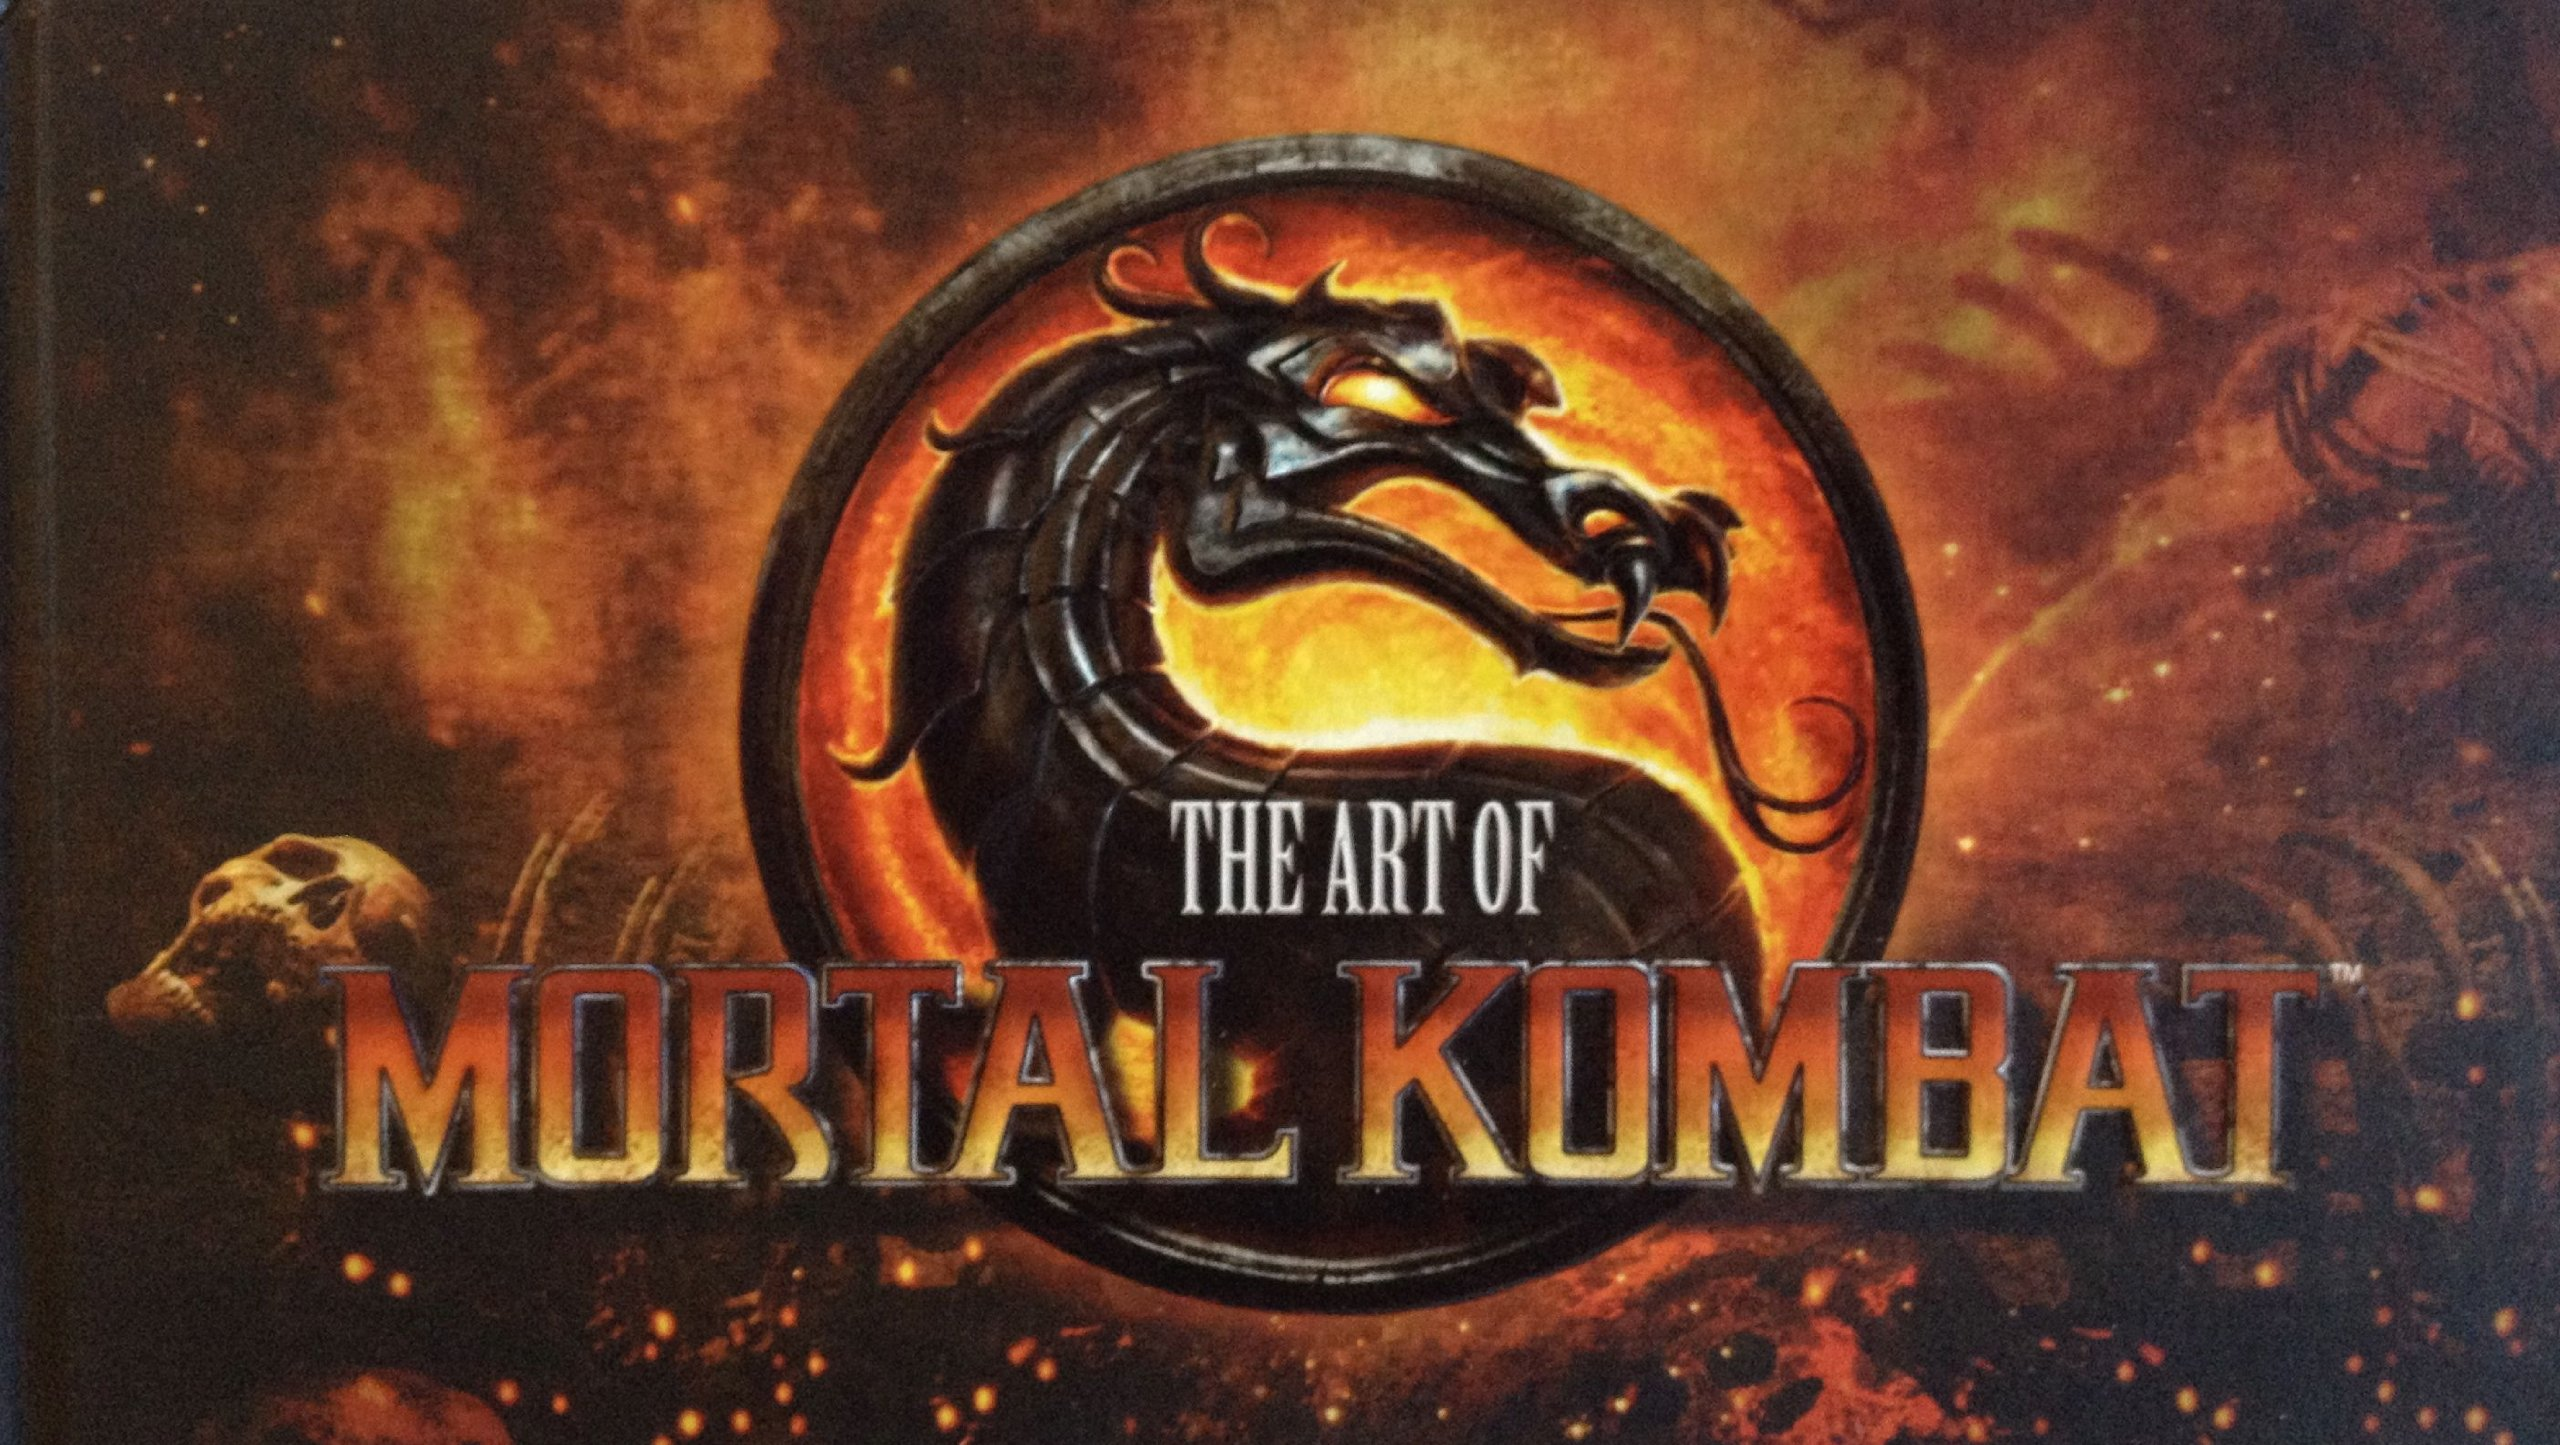 The Art Of Mortal Kombat Netherrealm Studios Ed Boon Steve